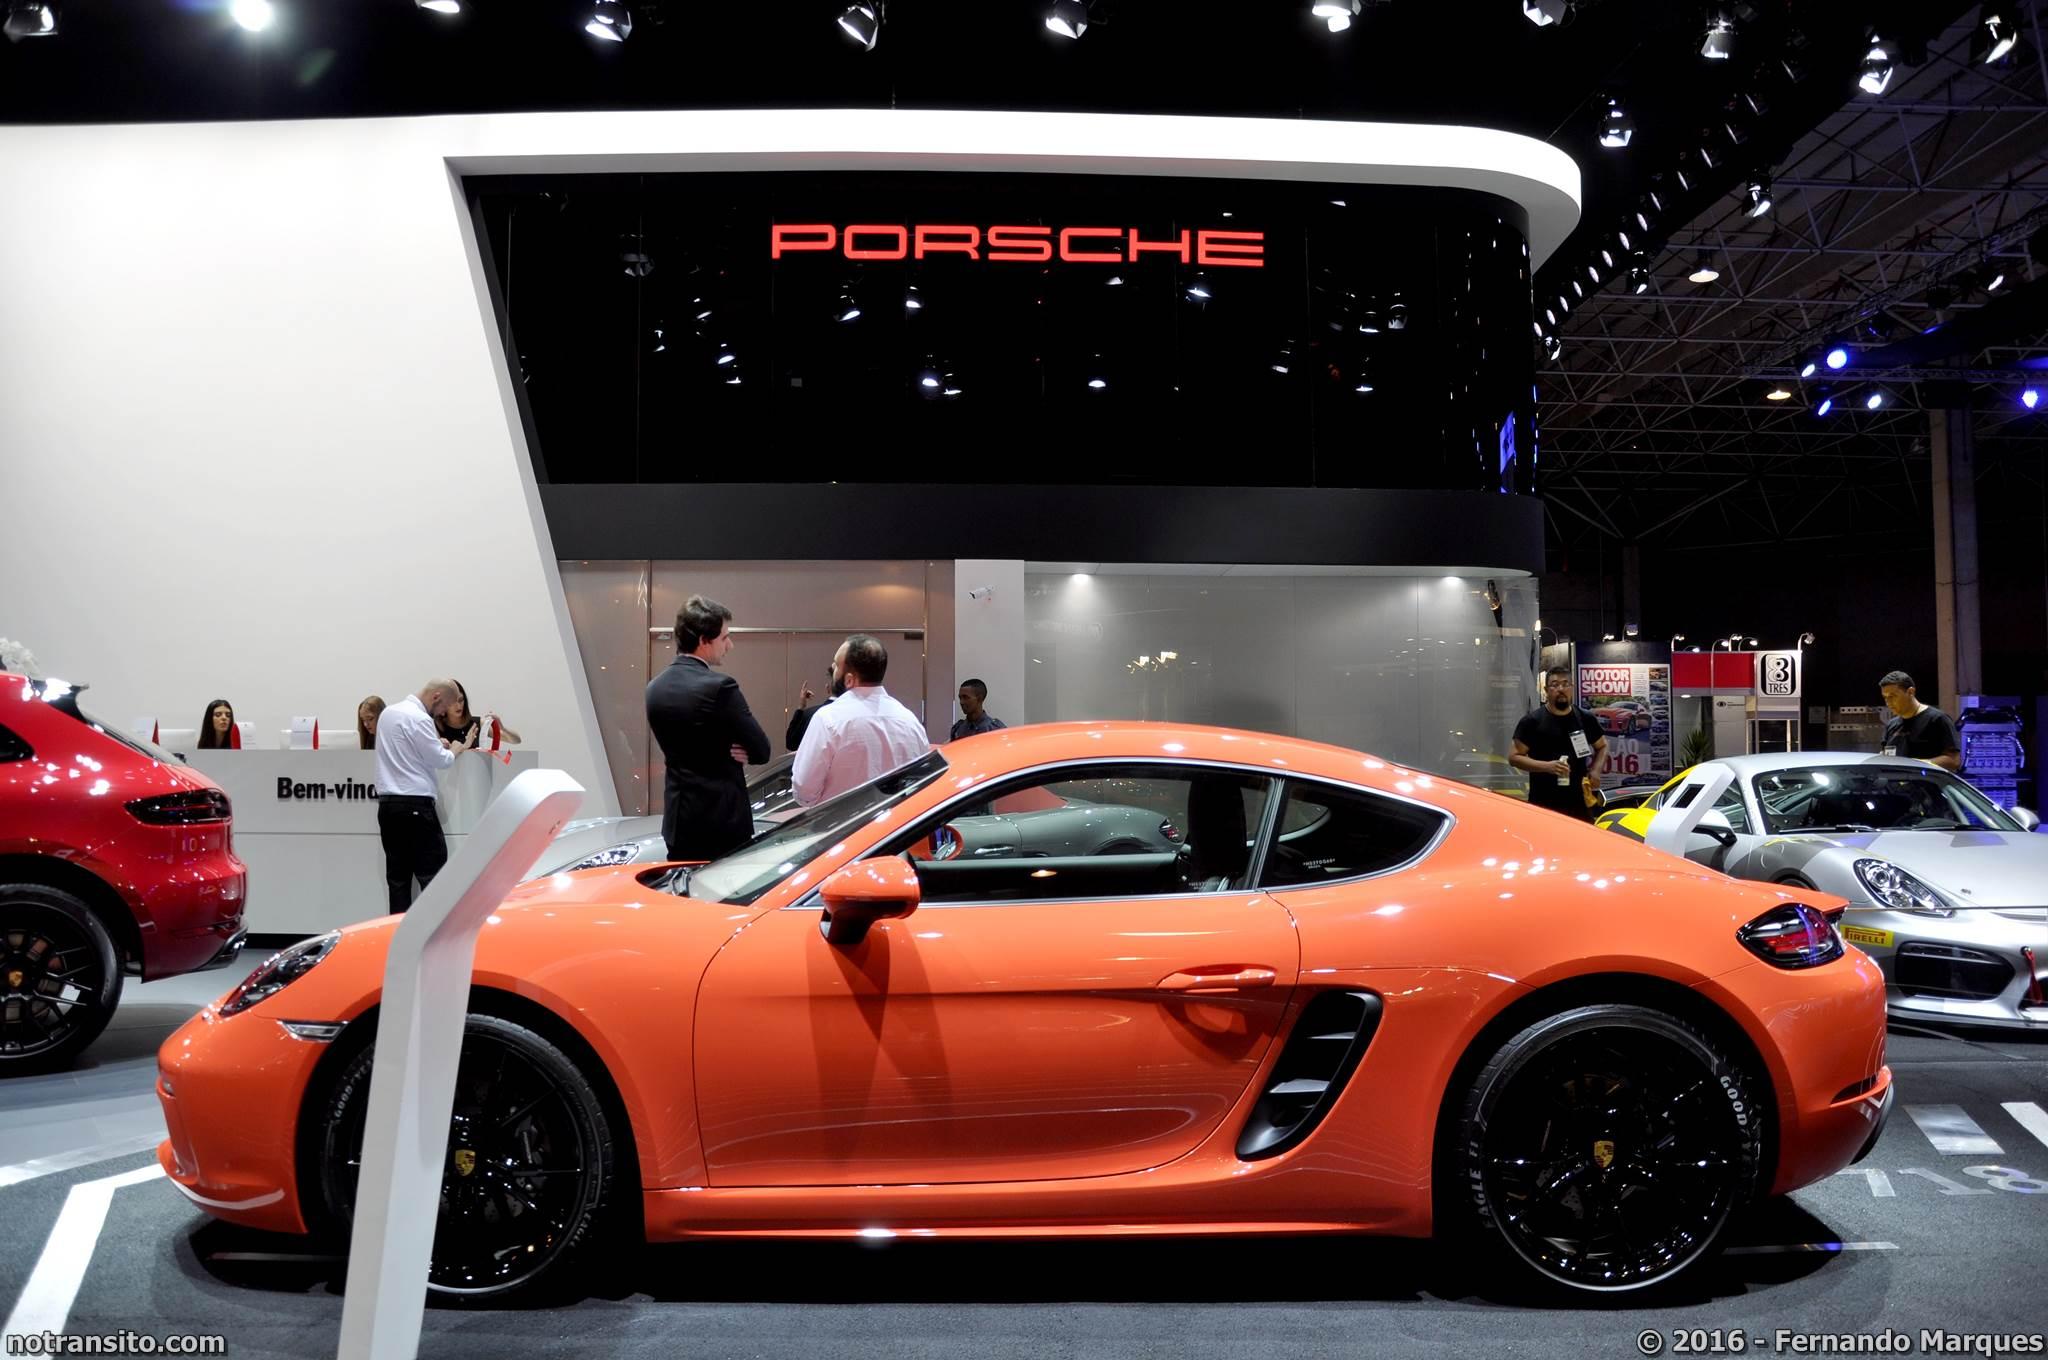 Porsche 718 Cayman Laranja Lava, Salão do Automóvel 2016, 29º Salão do Automóvel de São Paulo